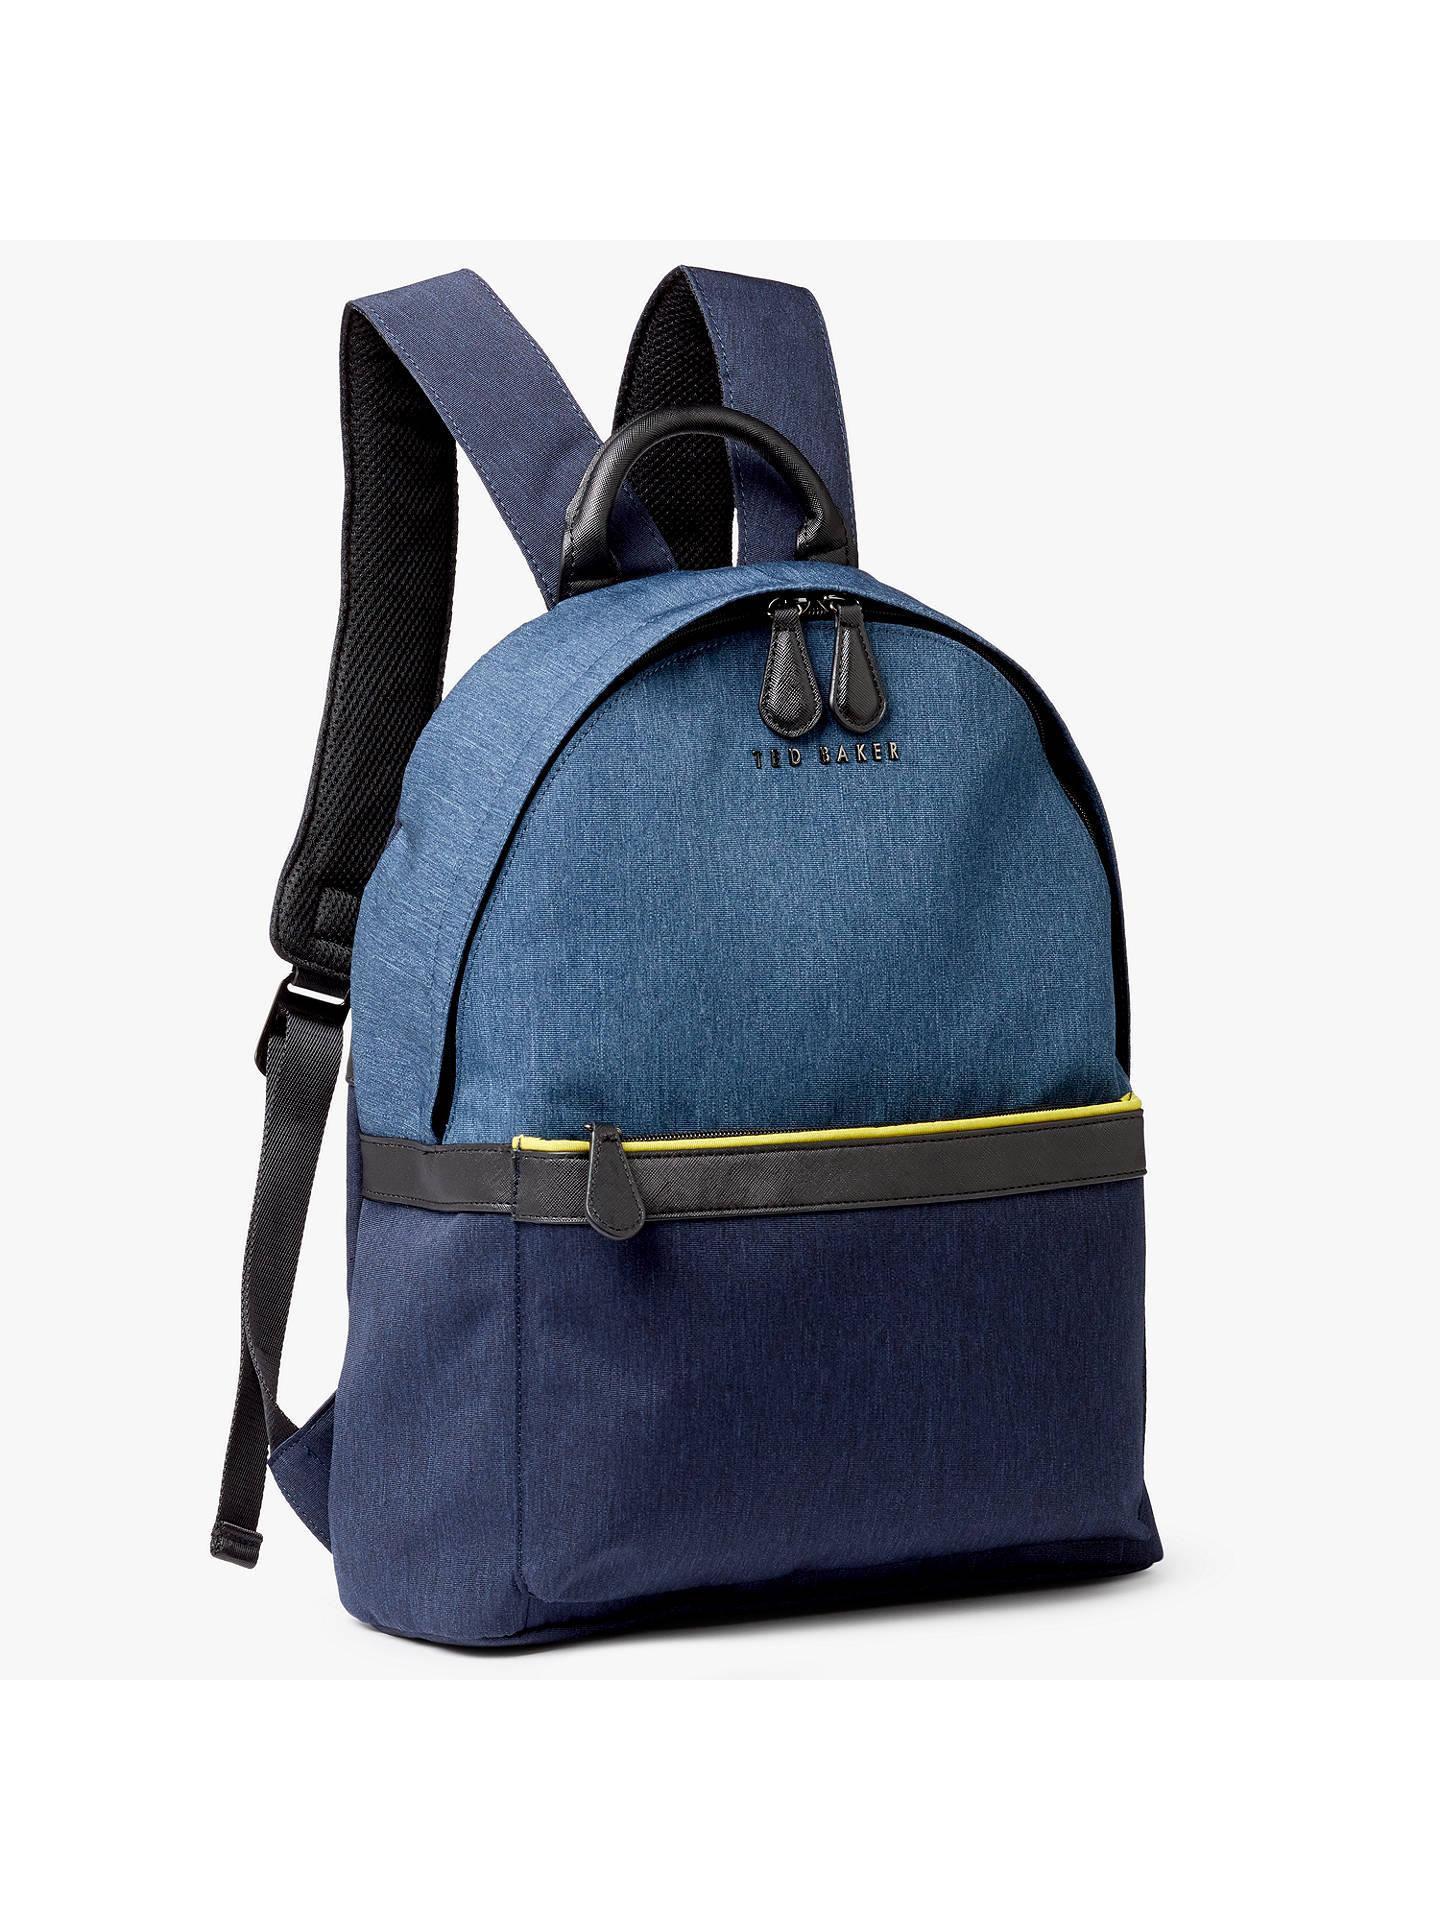 57b476b08 Ted Baker Zirabi Contrast Trim Backpack at John Lewis & Partners